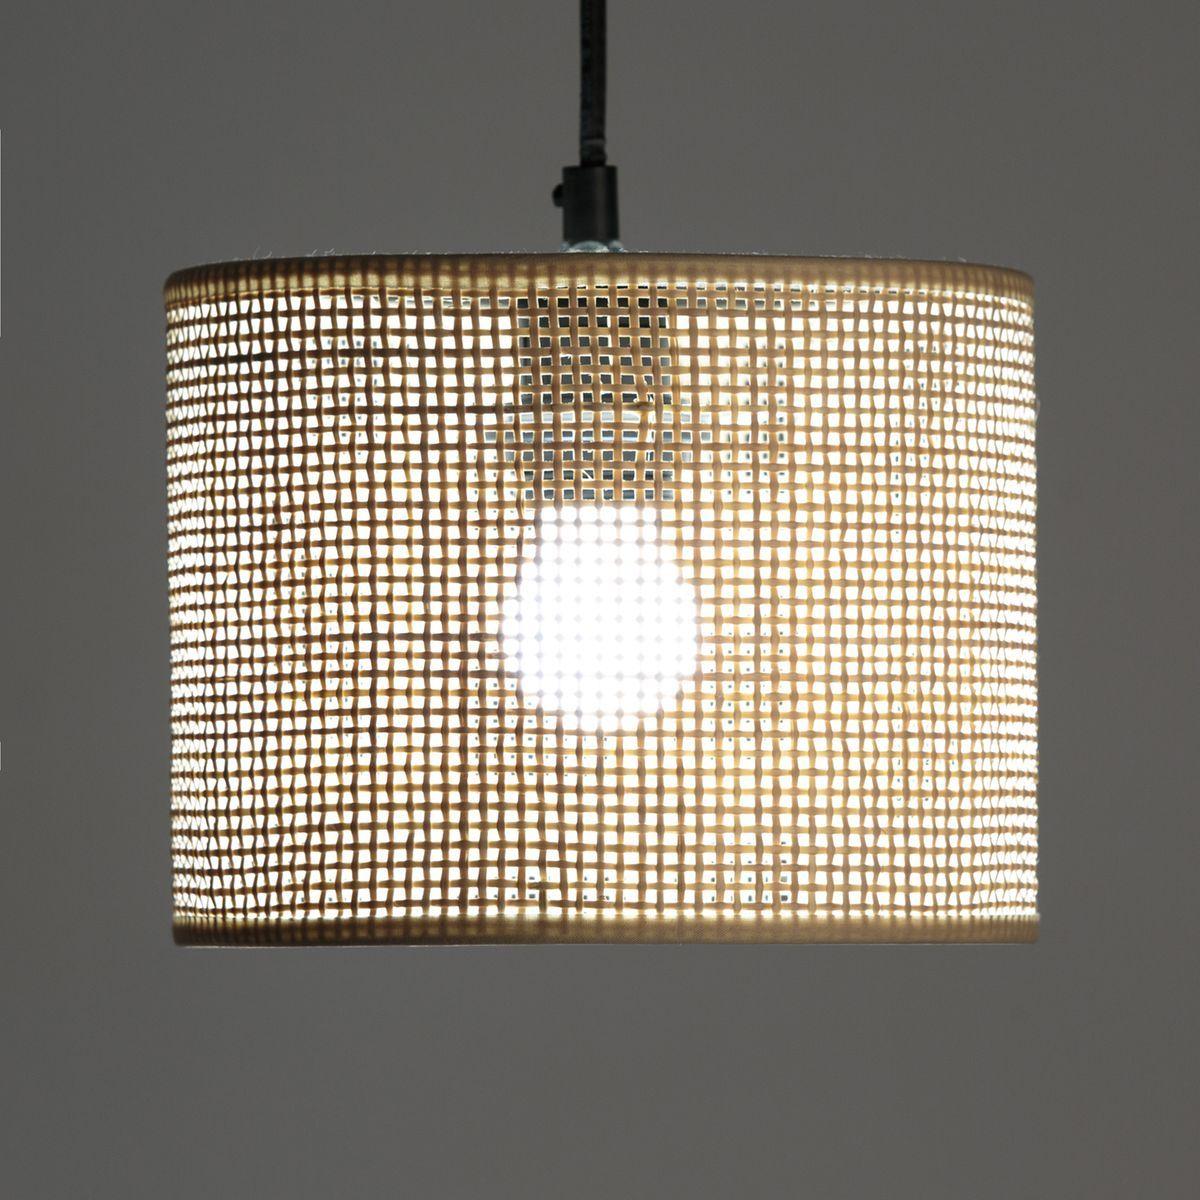 Diy Lampe En Cannage 54887689195131162 In 2020 Diy Lamp Diy